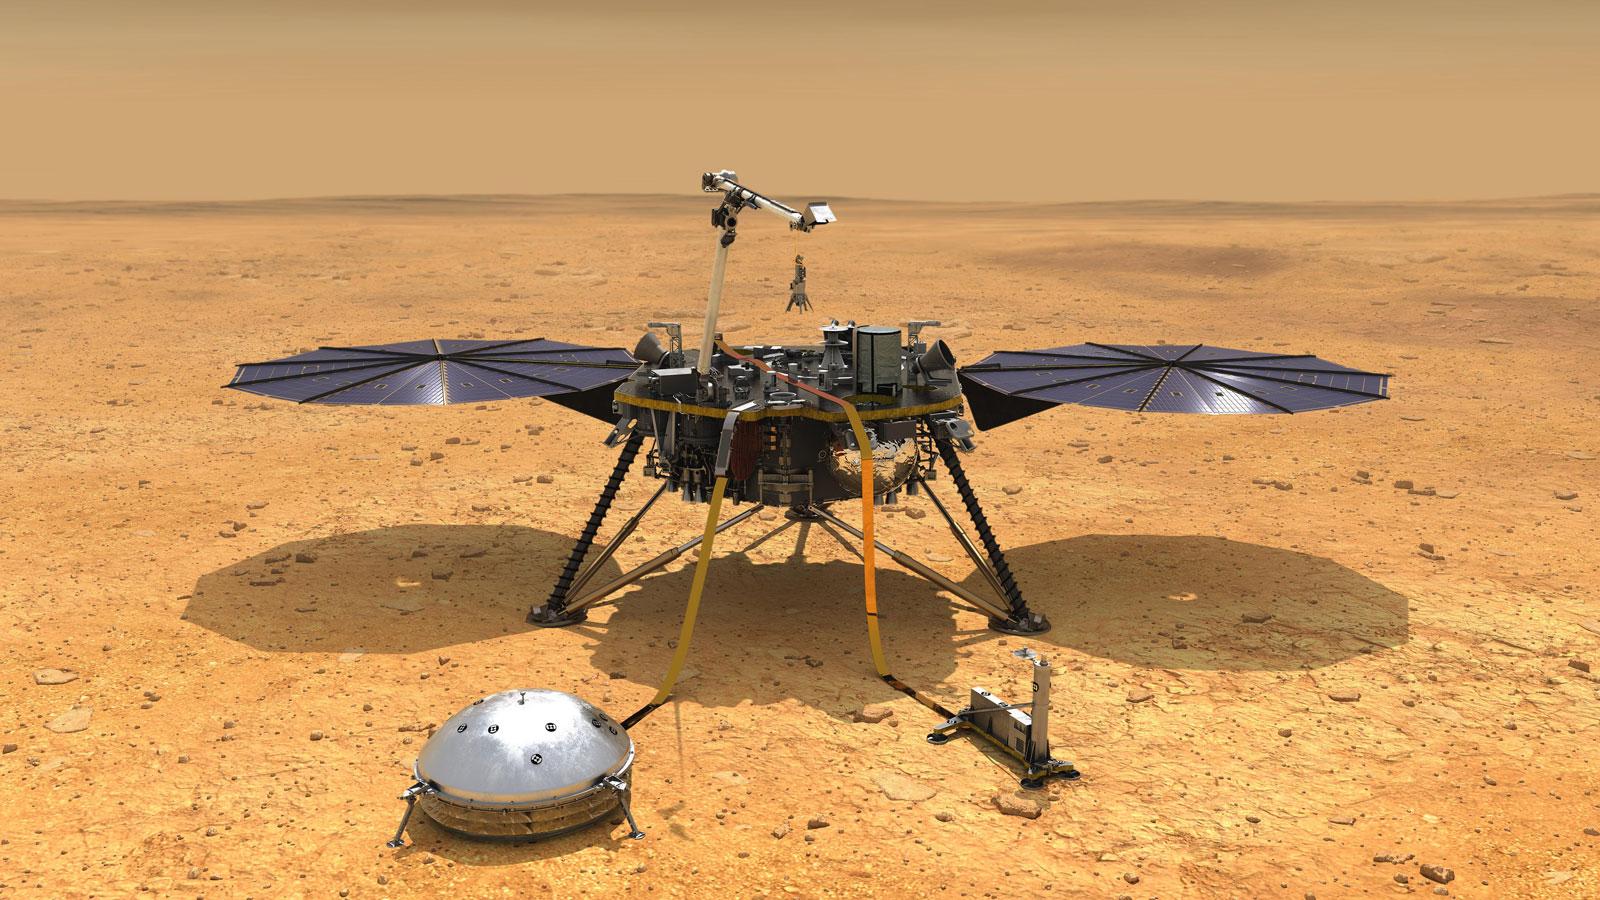 NASA's InSight probe has been on Martian soil since 2018.